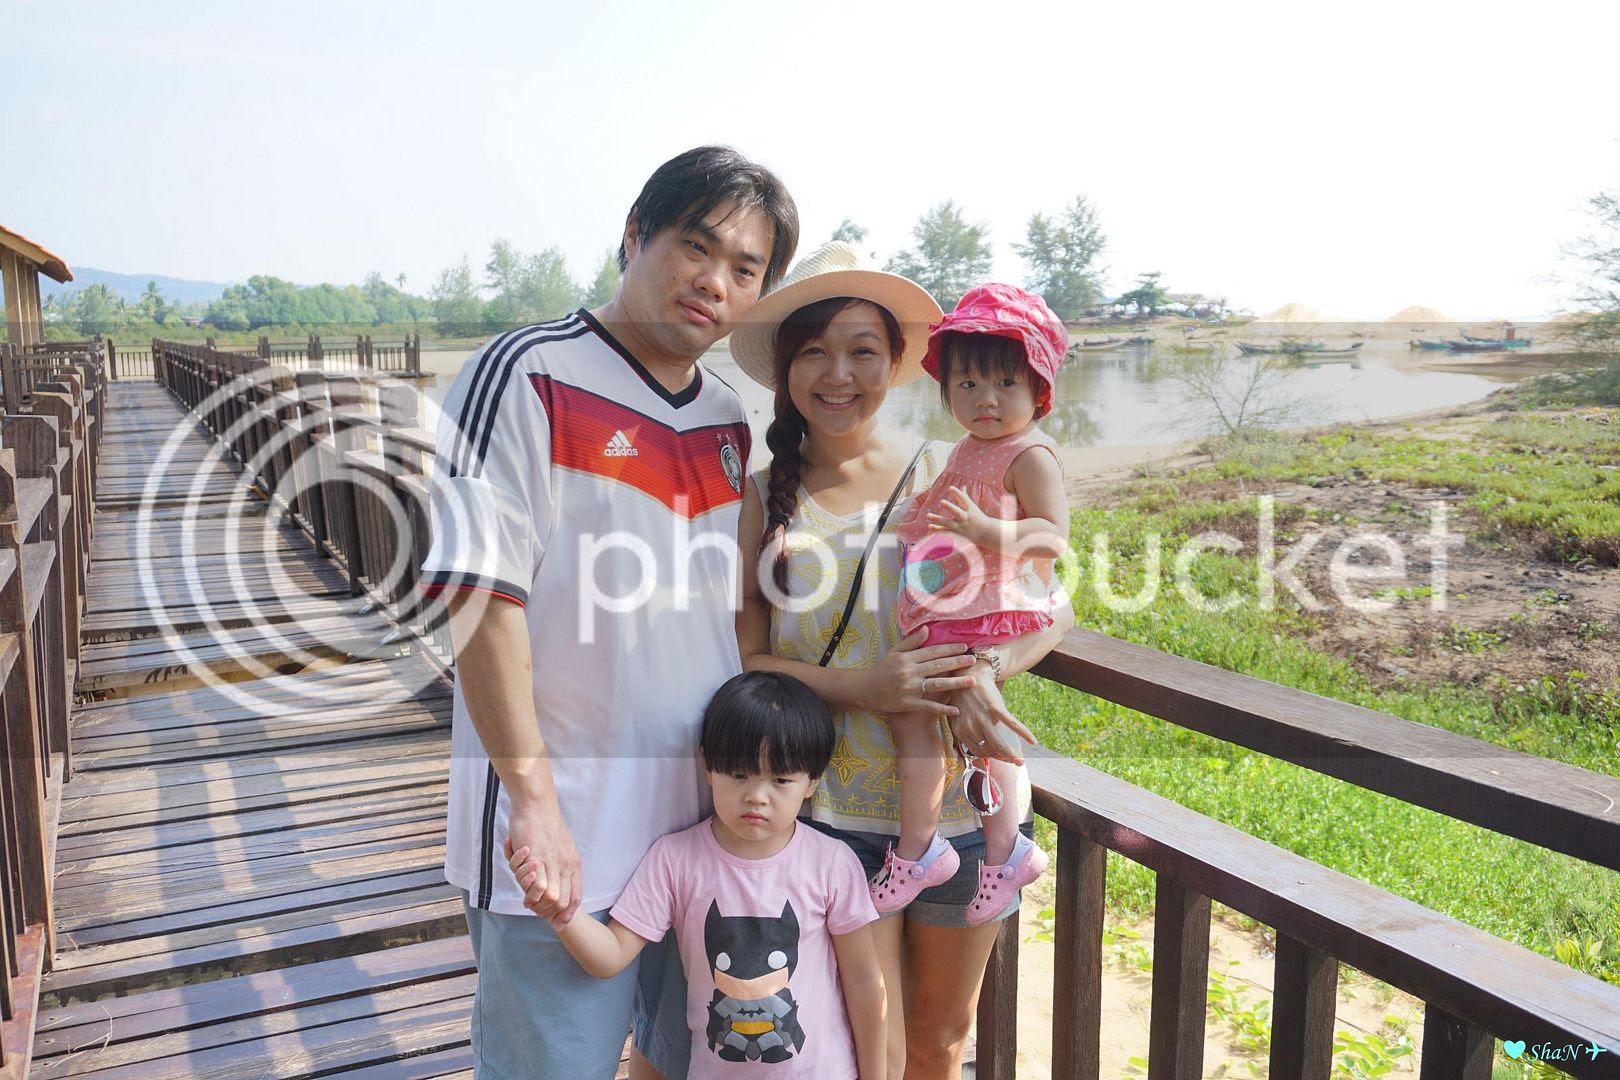 photo KT 9_zps3l2daiv2.jpg